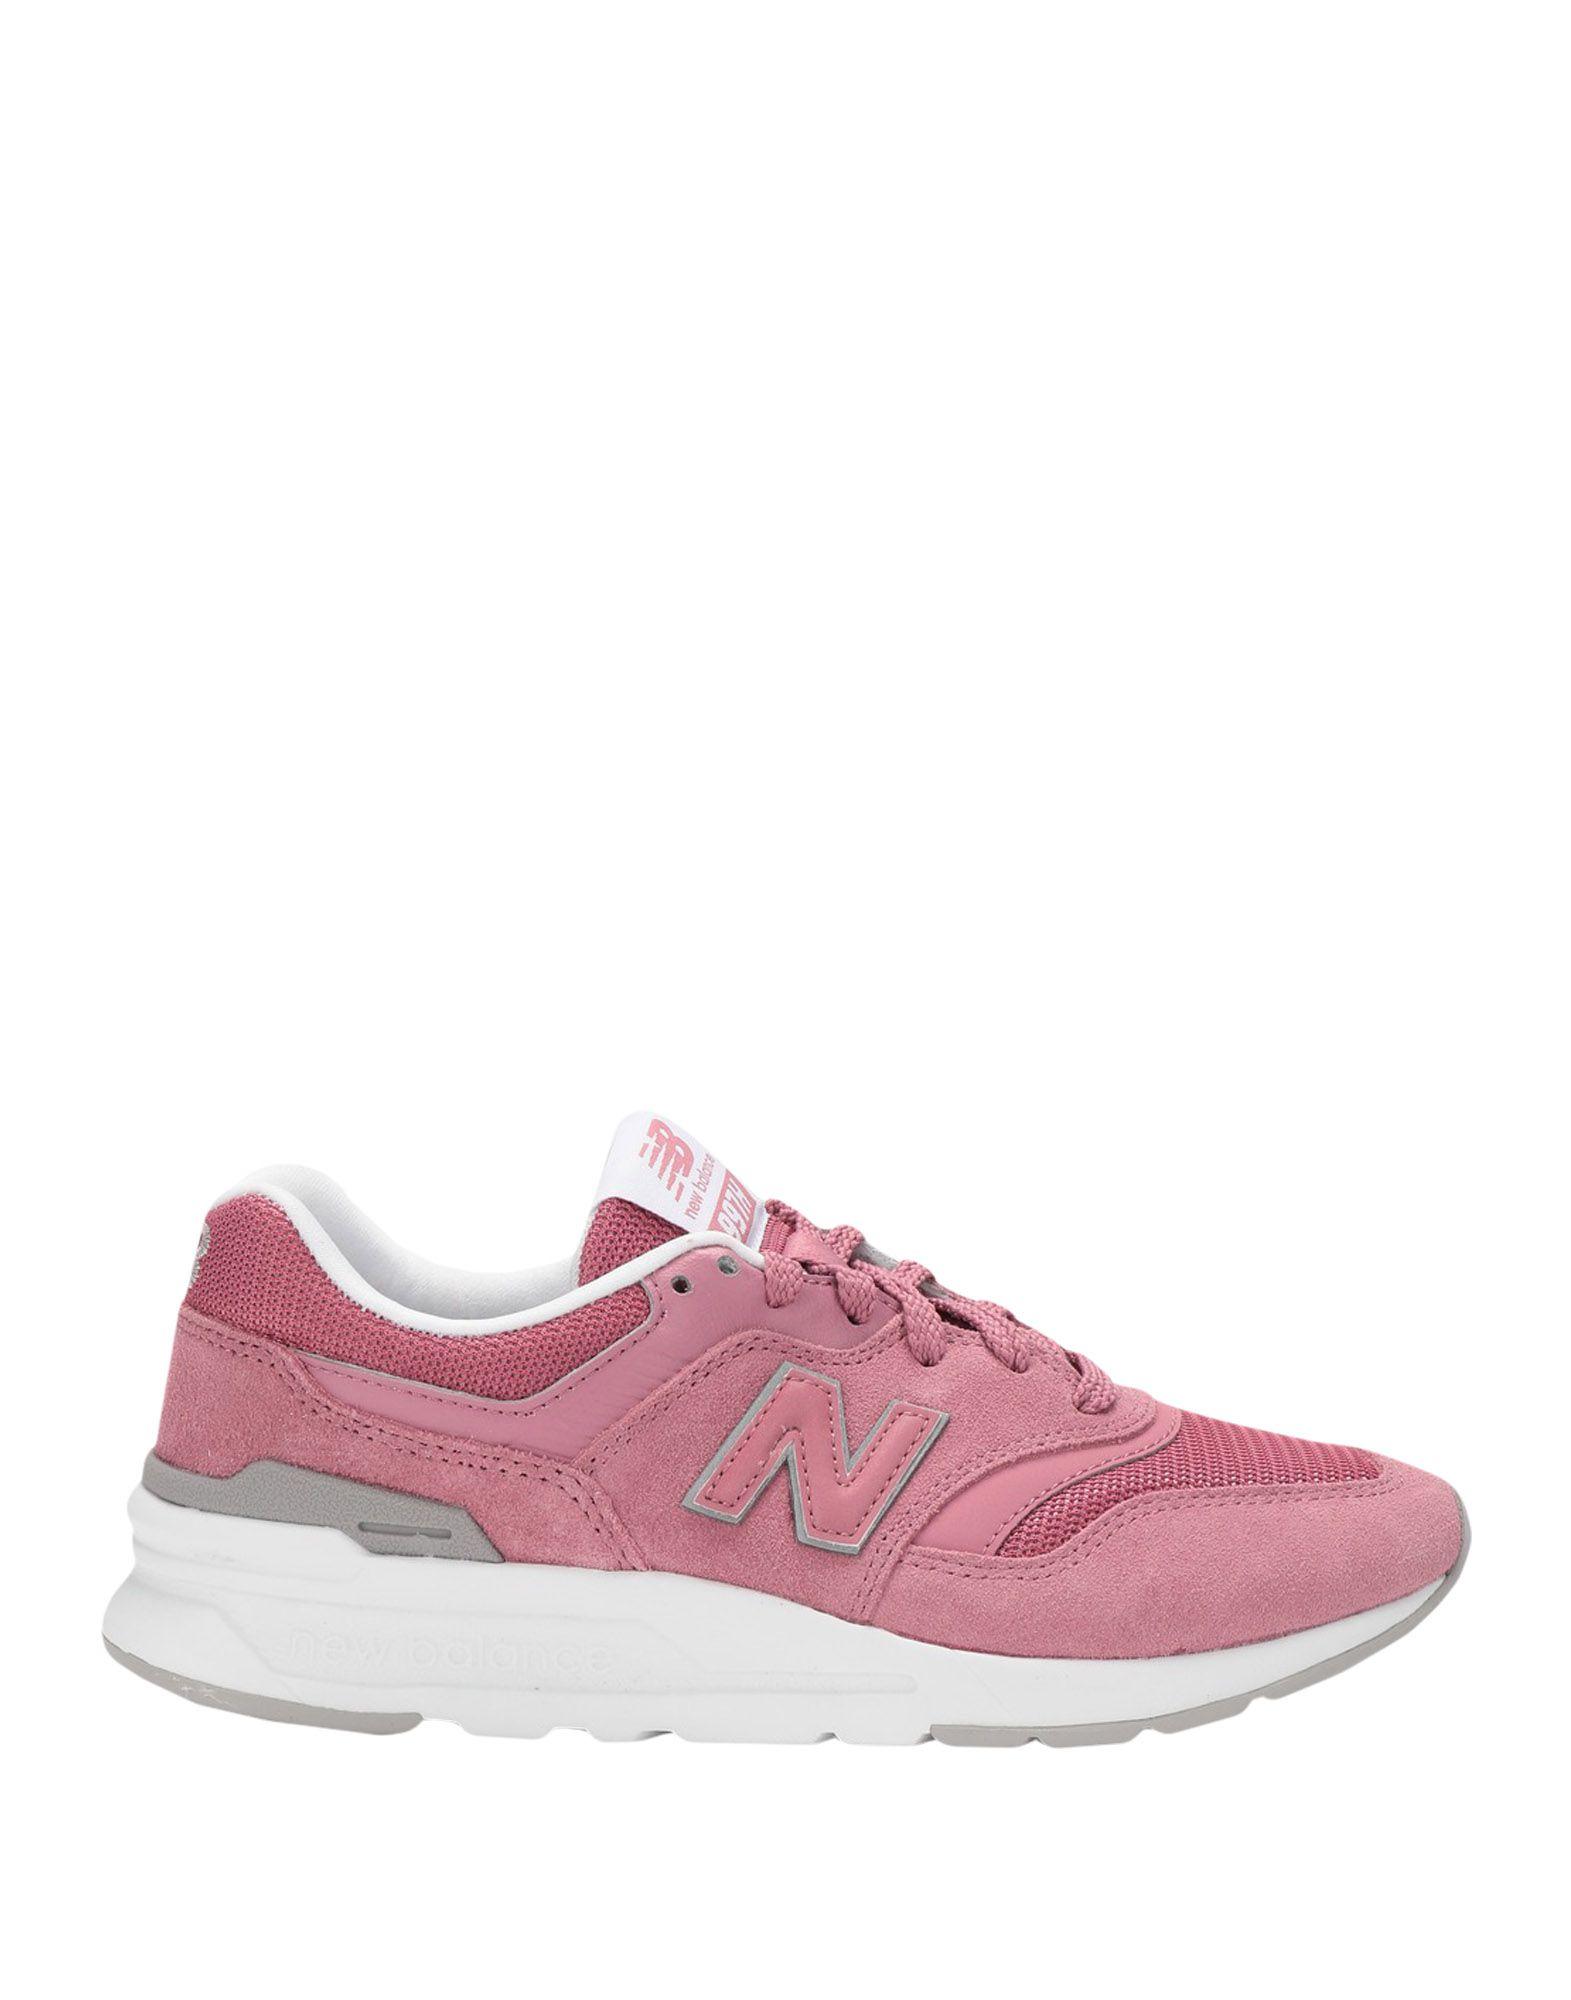 6a8e0b29cf60f 《セール開催中》NEW BALANCE レディース スニーカー&テニスシューズ(ローカット) ピンク